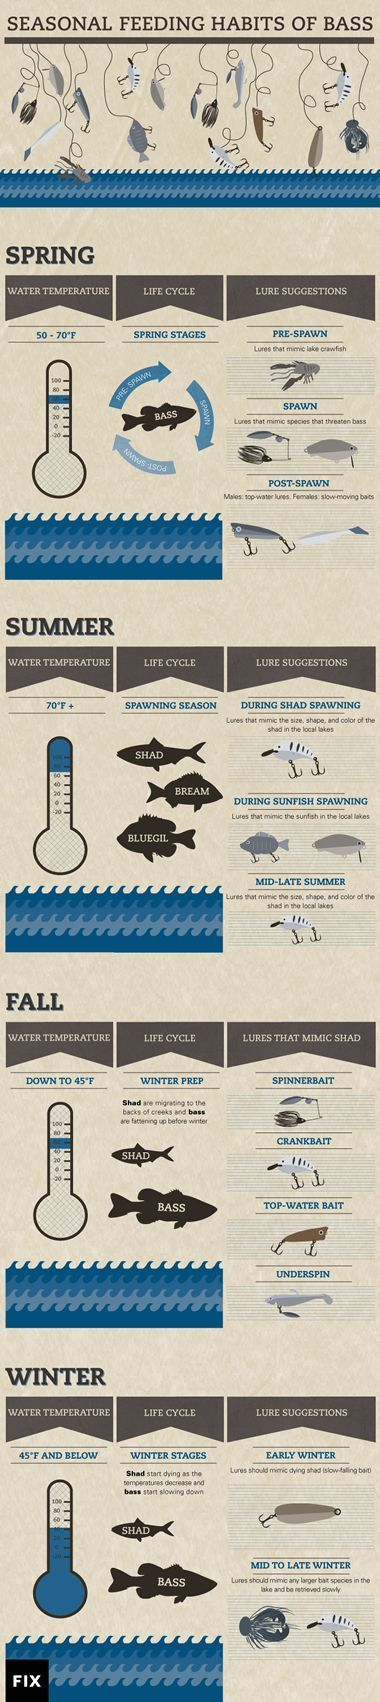 Bass Fishing by Season | Fix.com